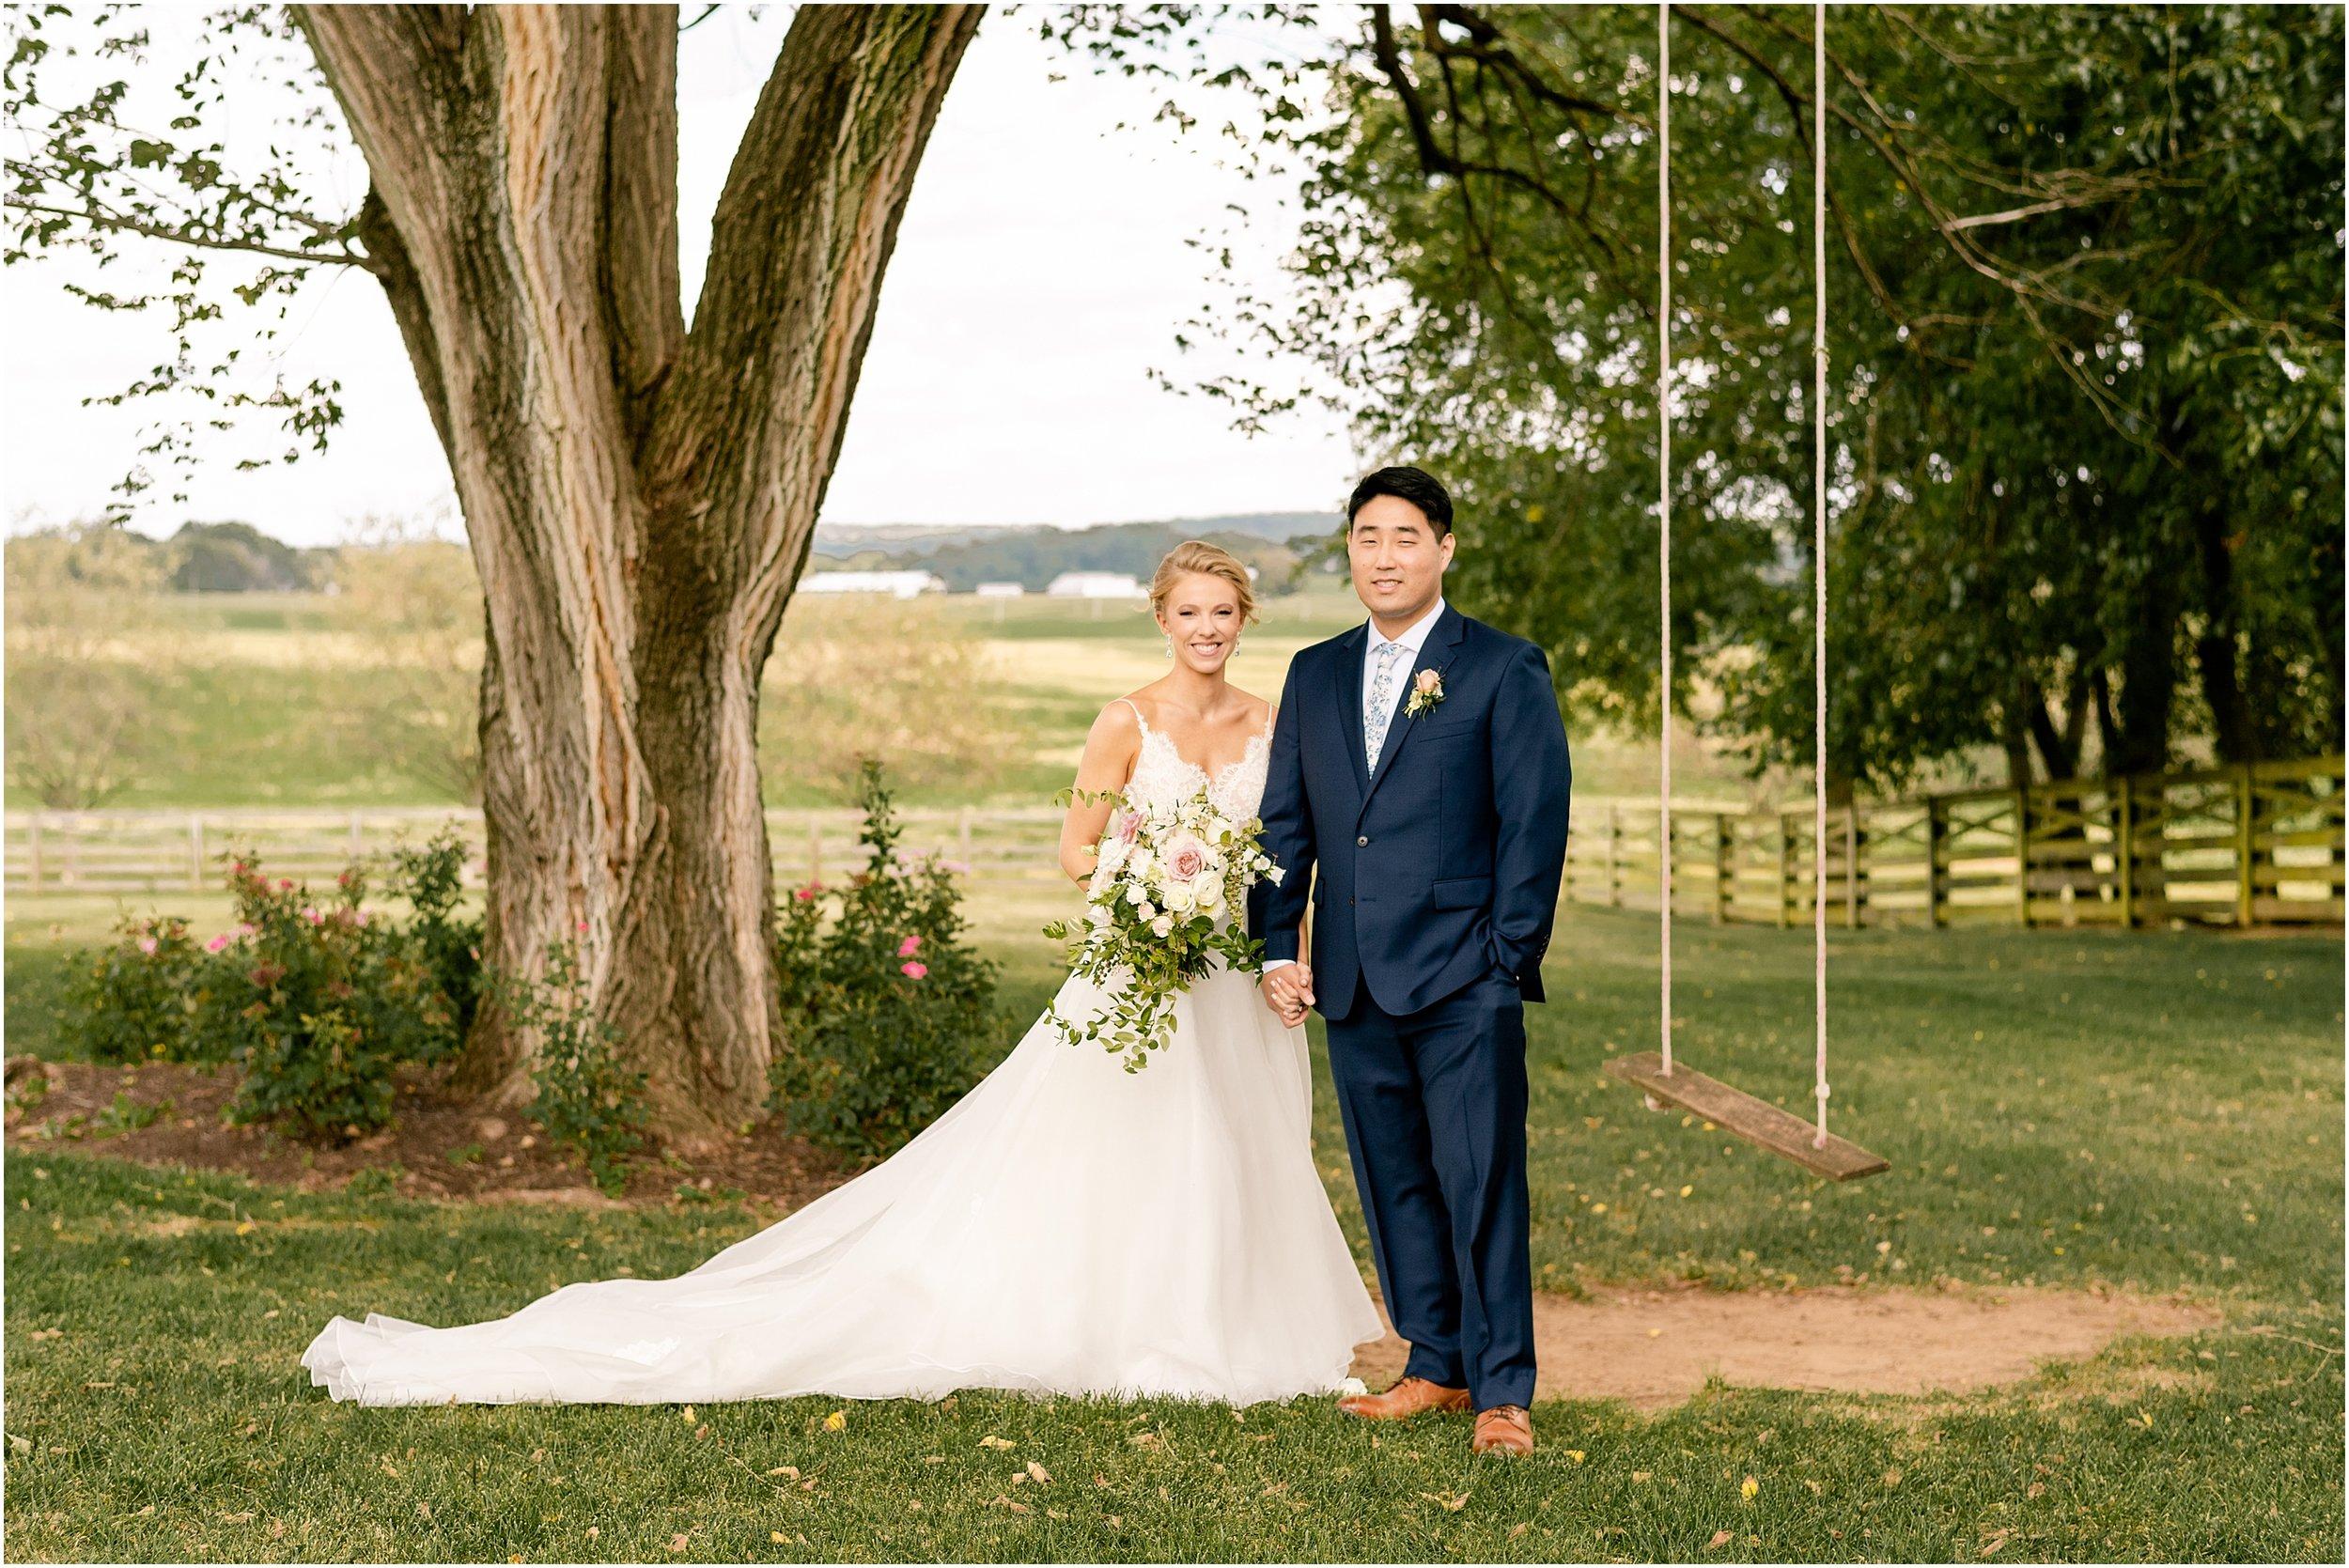 hannah leigh photography Walkers Overlook Wedding Walkersville MD_3506.jpg